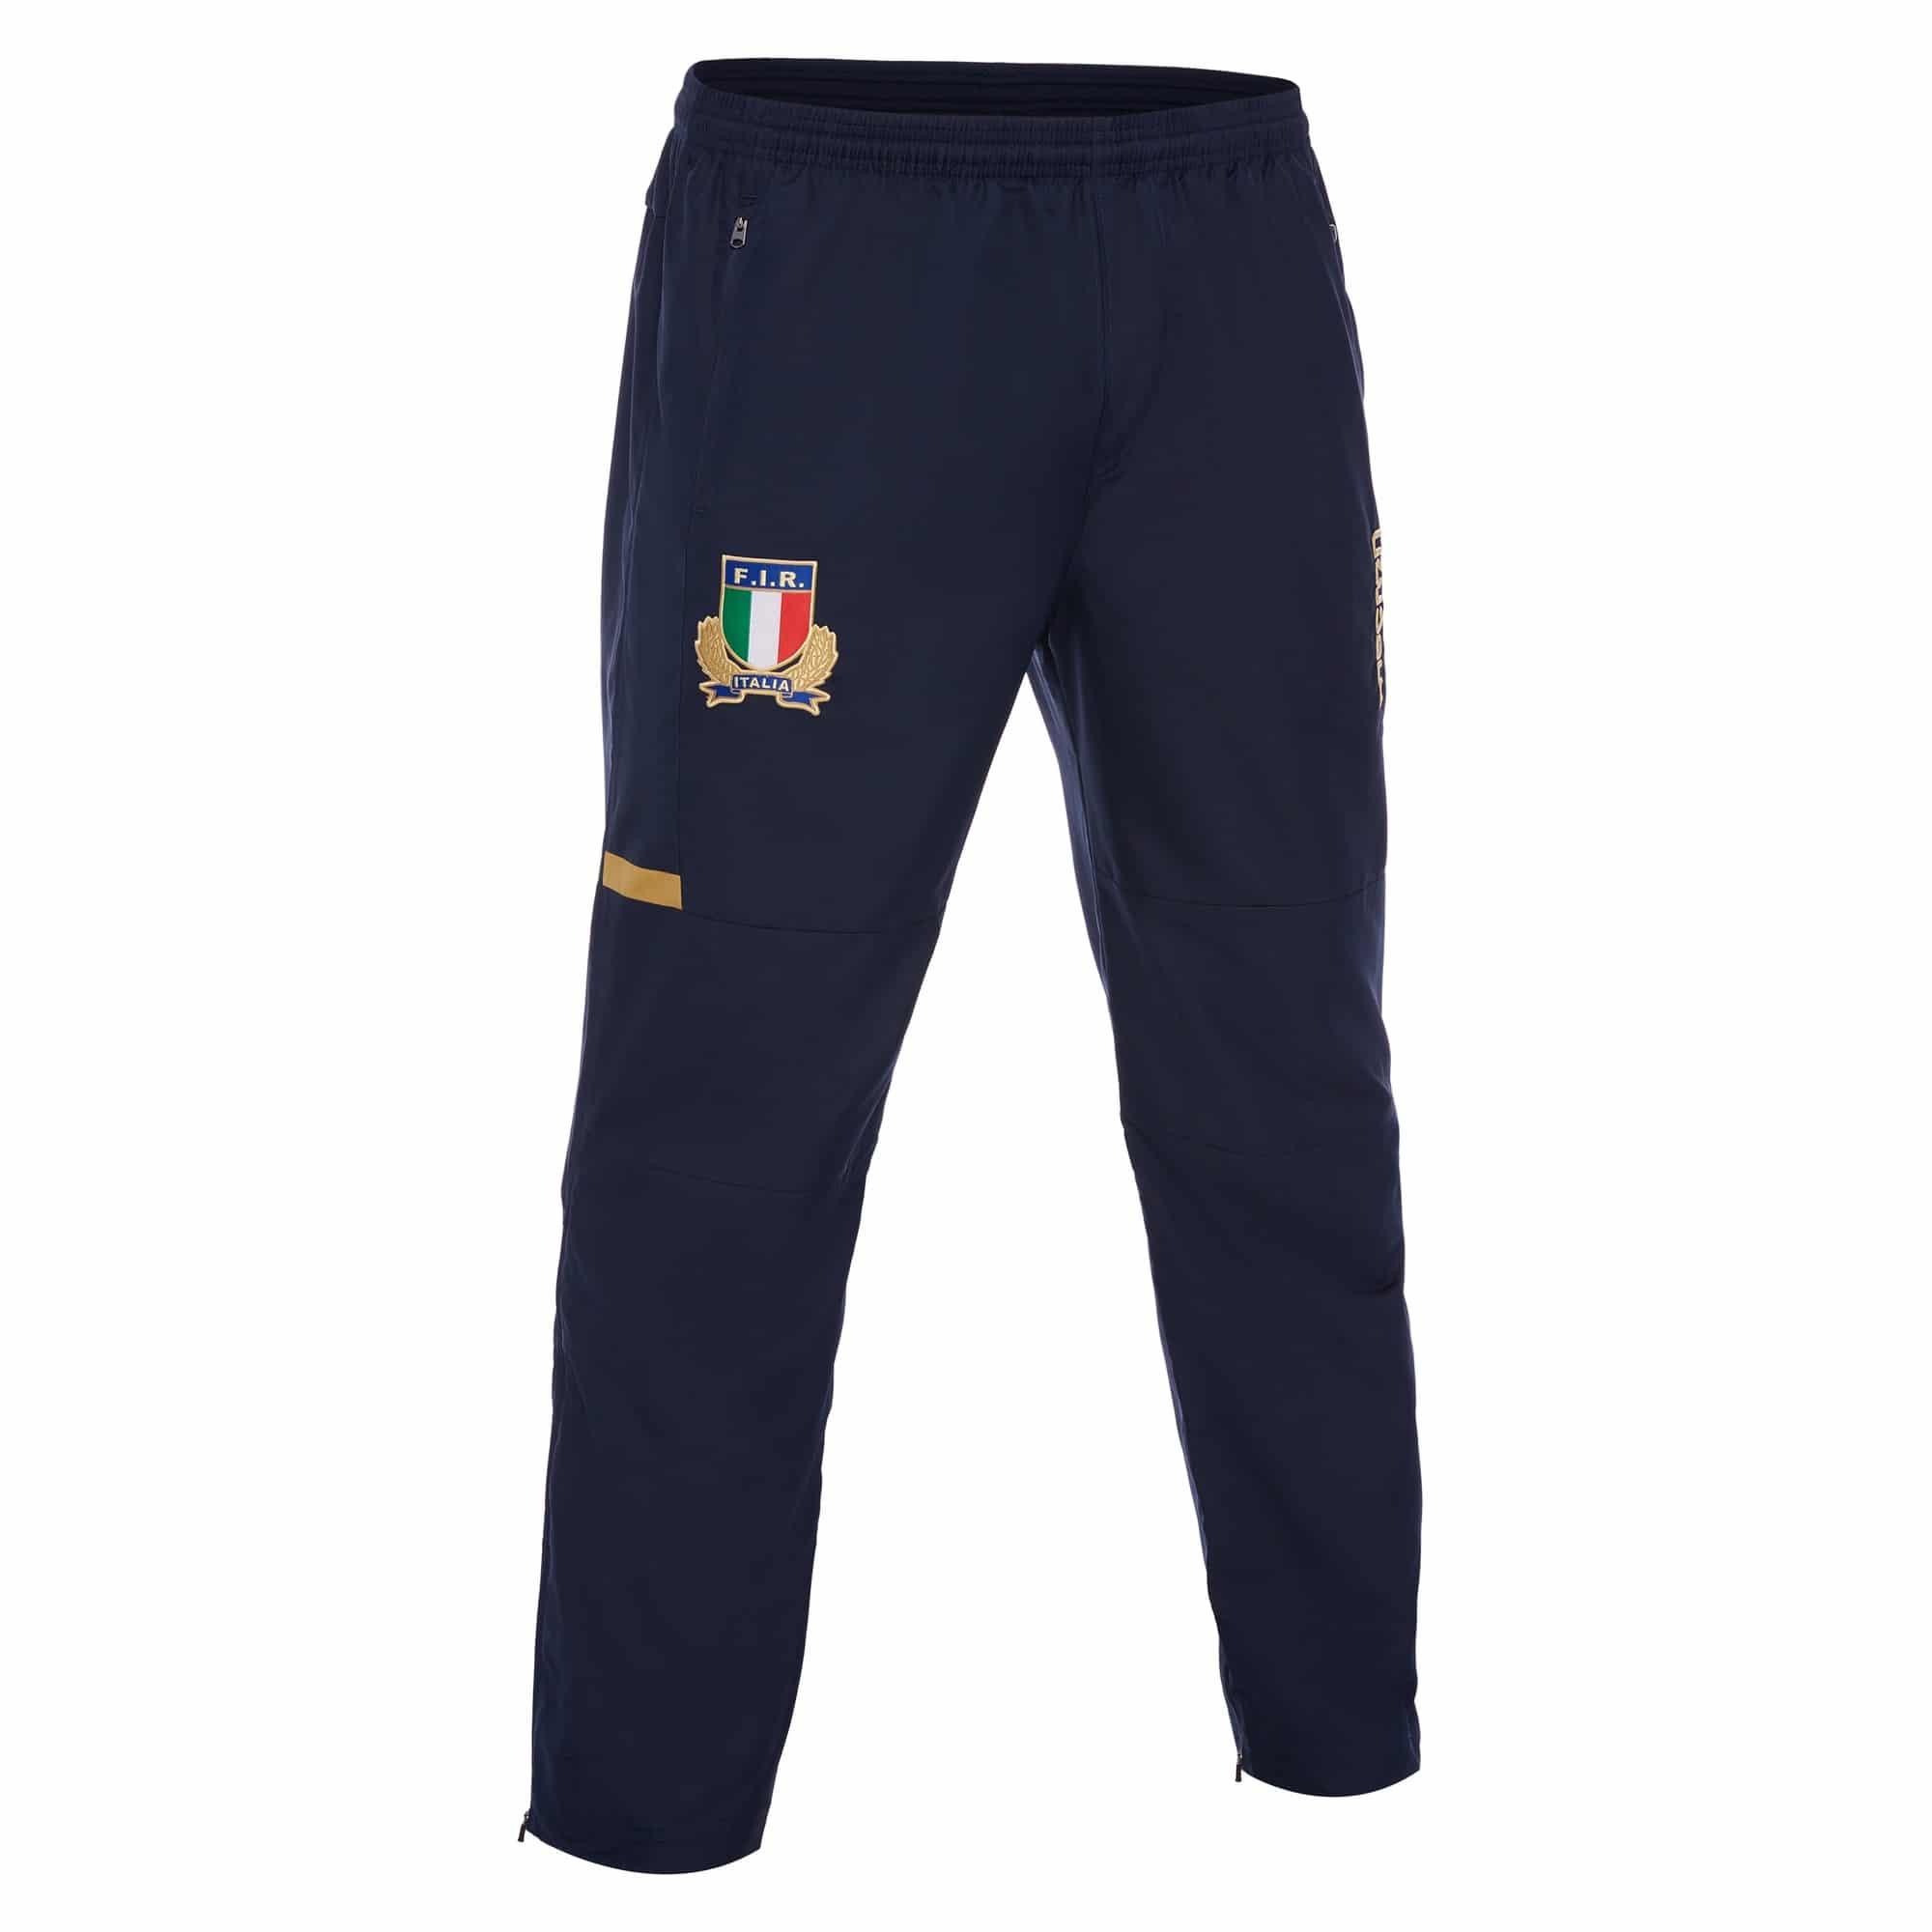 100% authentic ff382 4f0f9 TUTA ITALIA RUGBY 482